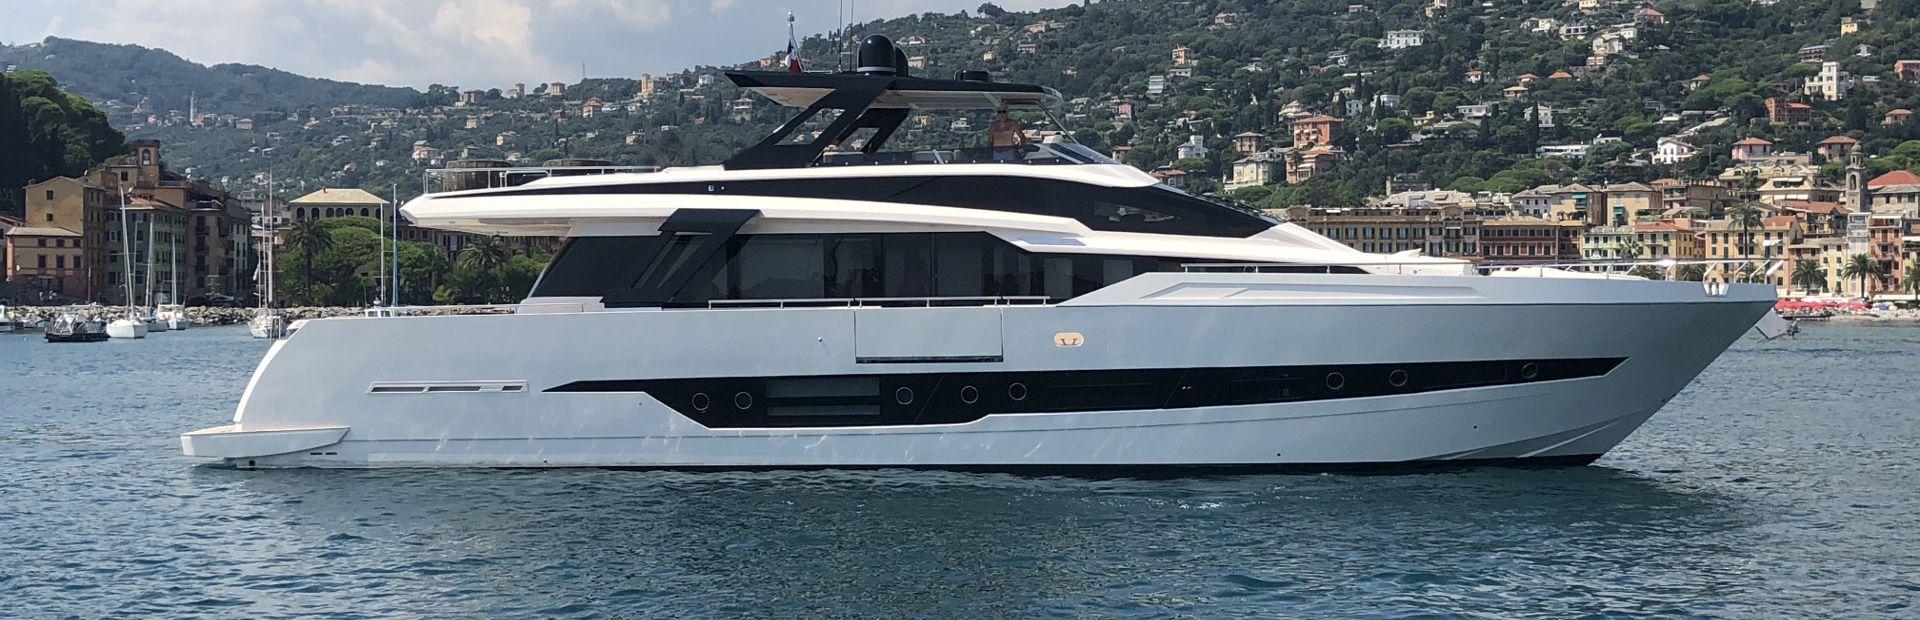 Cayman F920 Yacht Charter